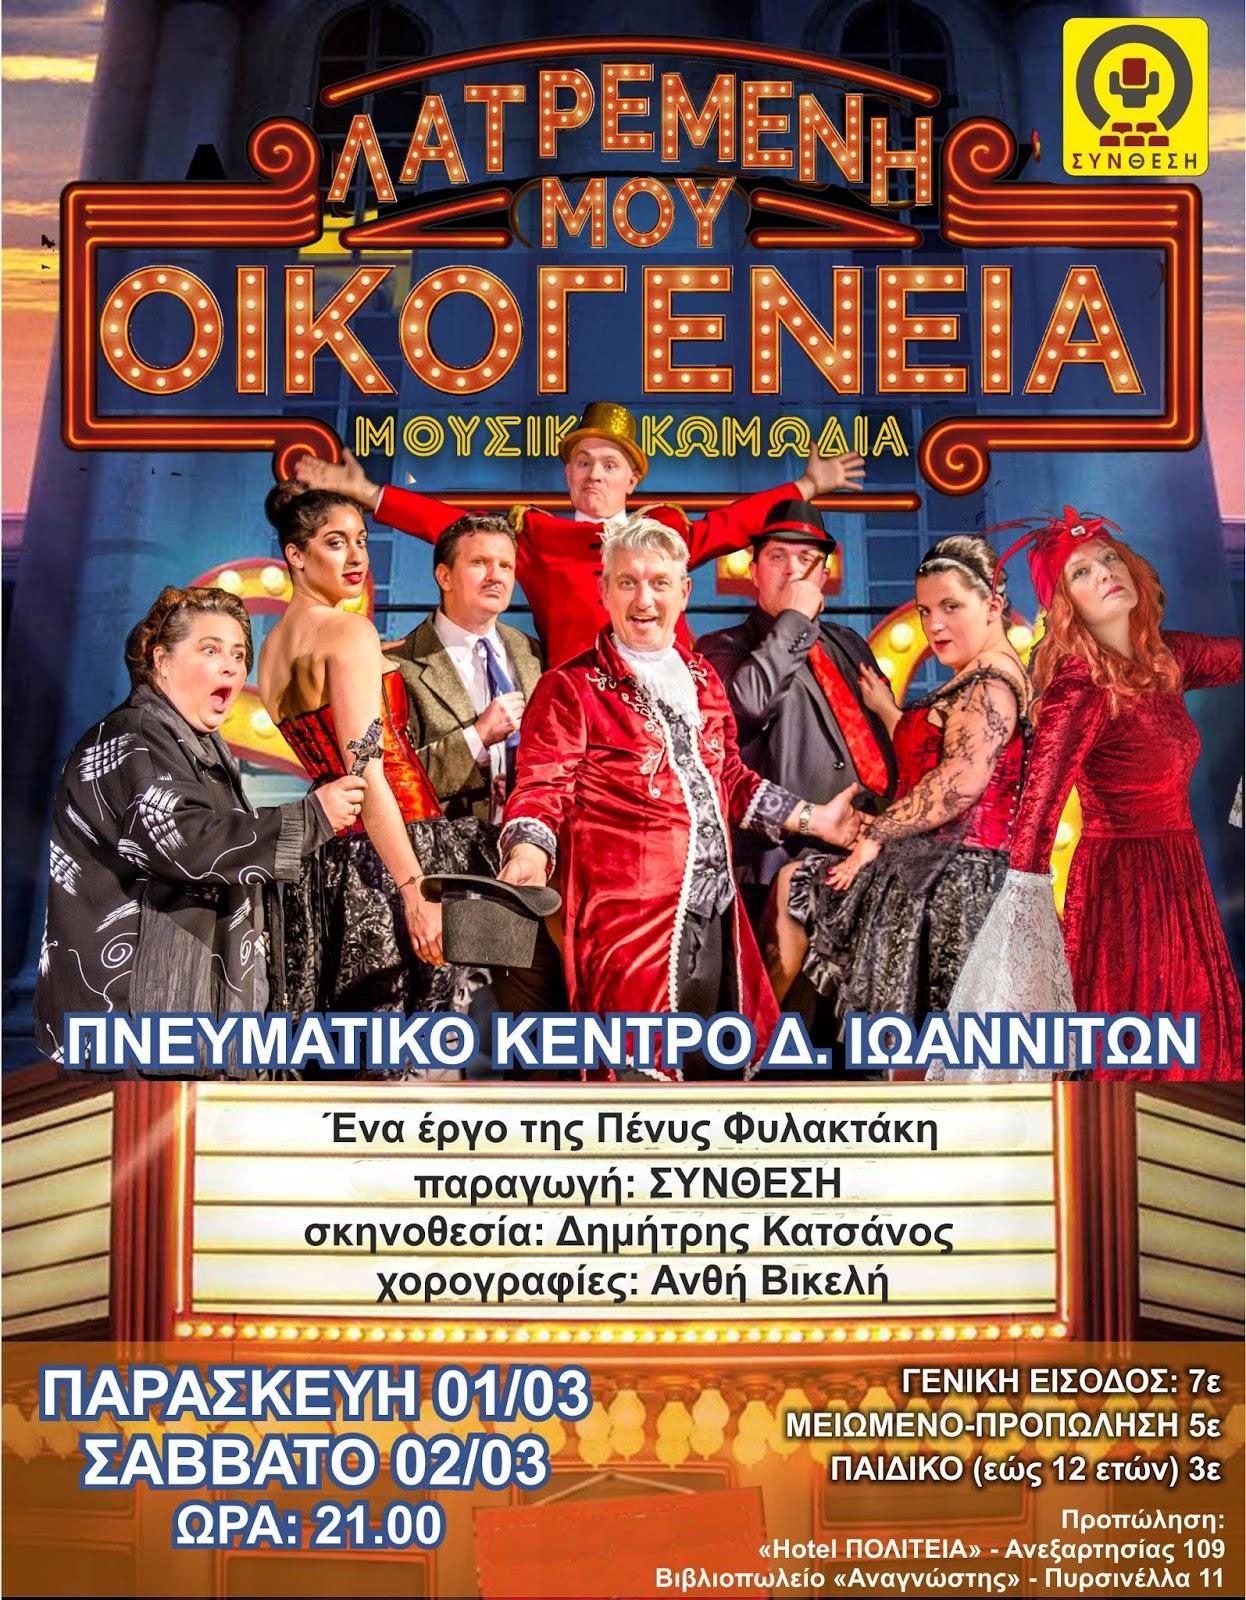 c1da0b04d2a4 «Λατρεμένη μου Οικογένεια» στα Ιωάννινα Ξεκίνησε η προπώληση των  εισιτηρίων! - EPIRUS TV NEWS